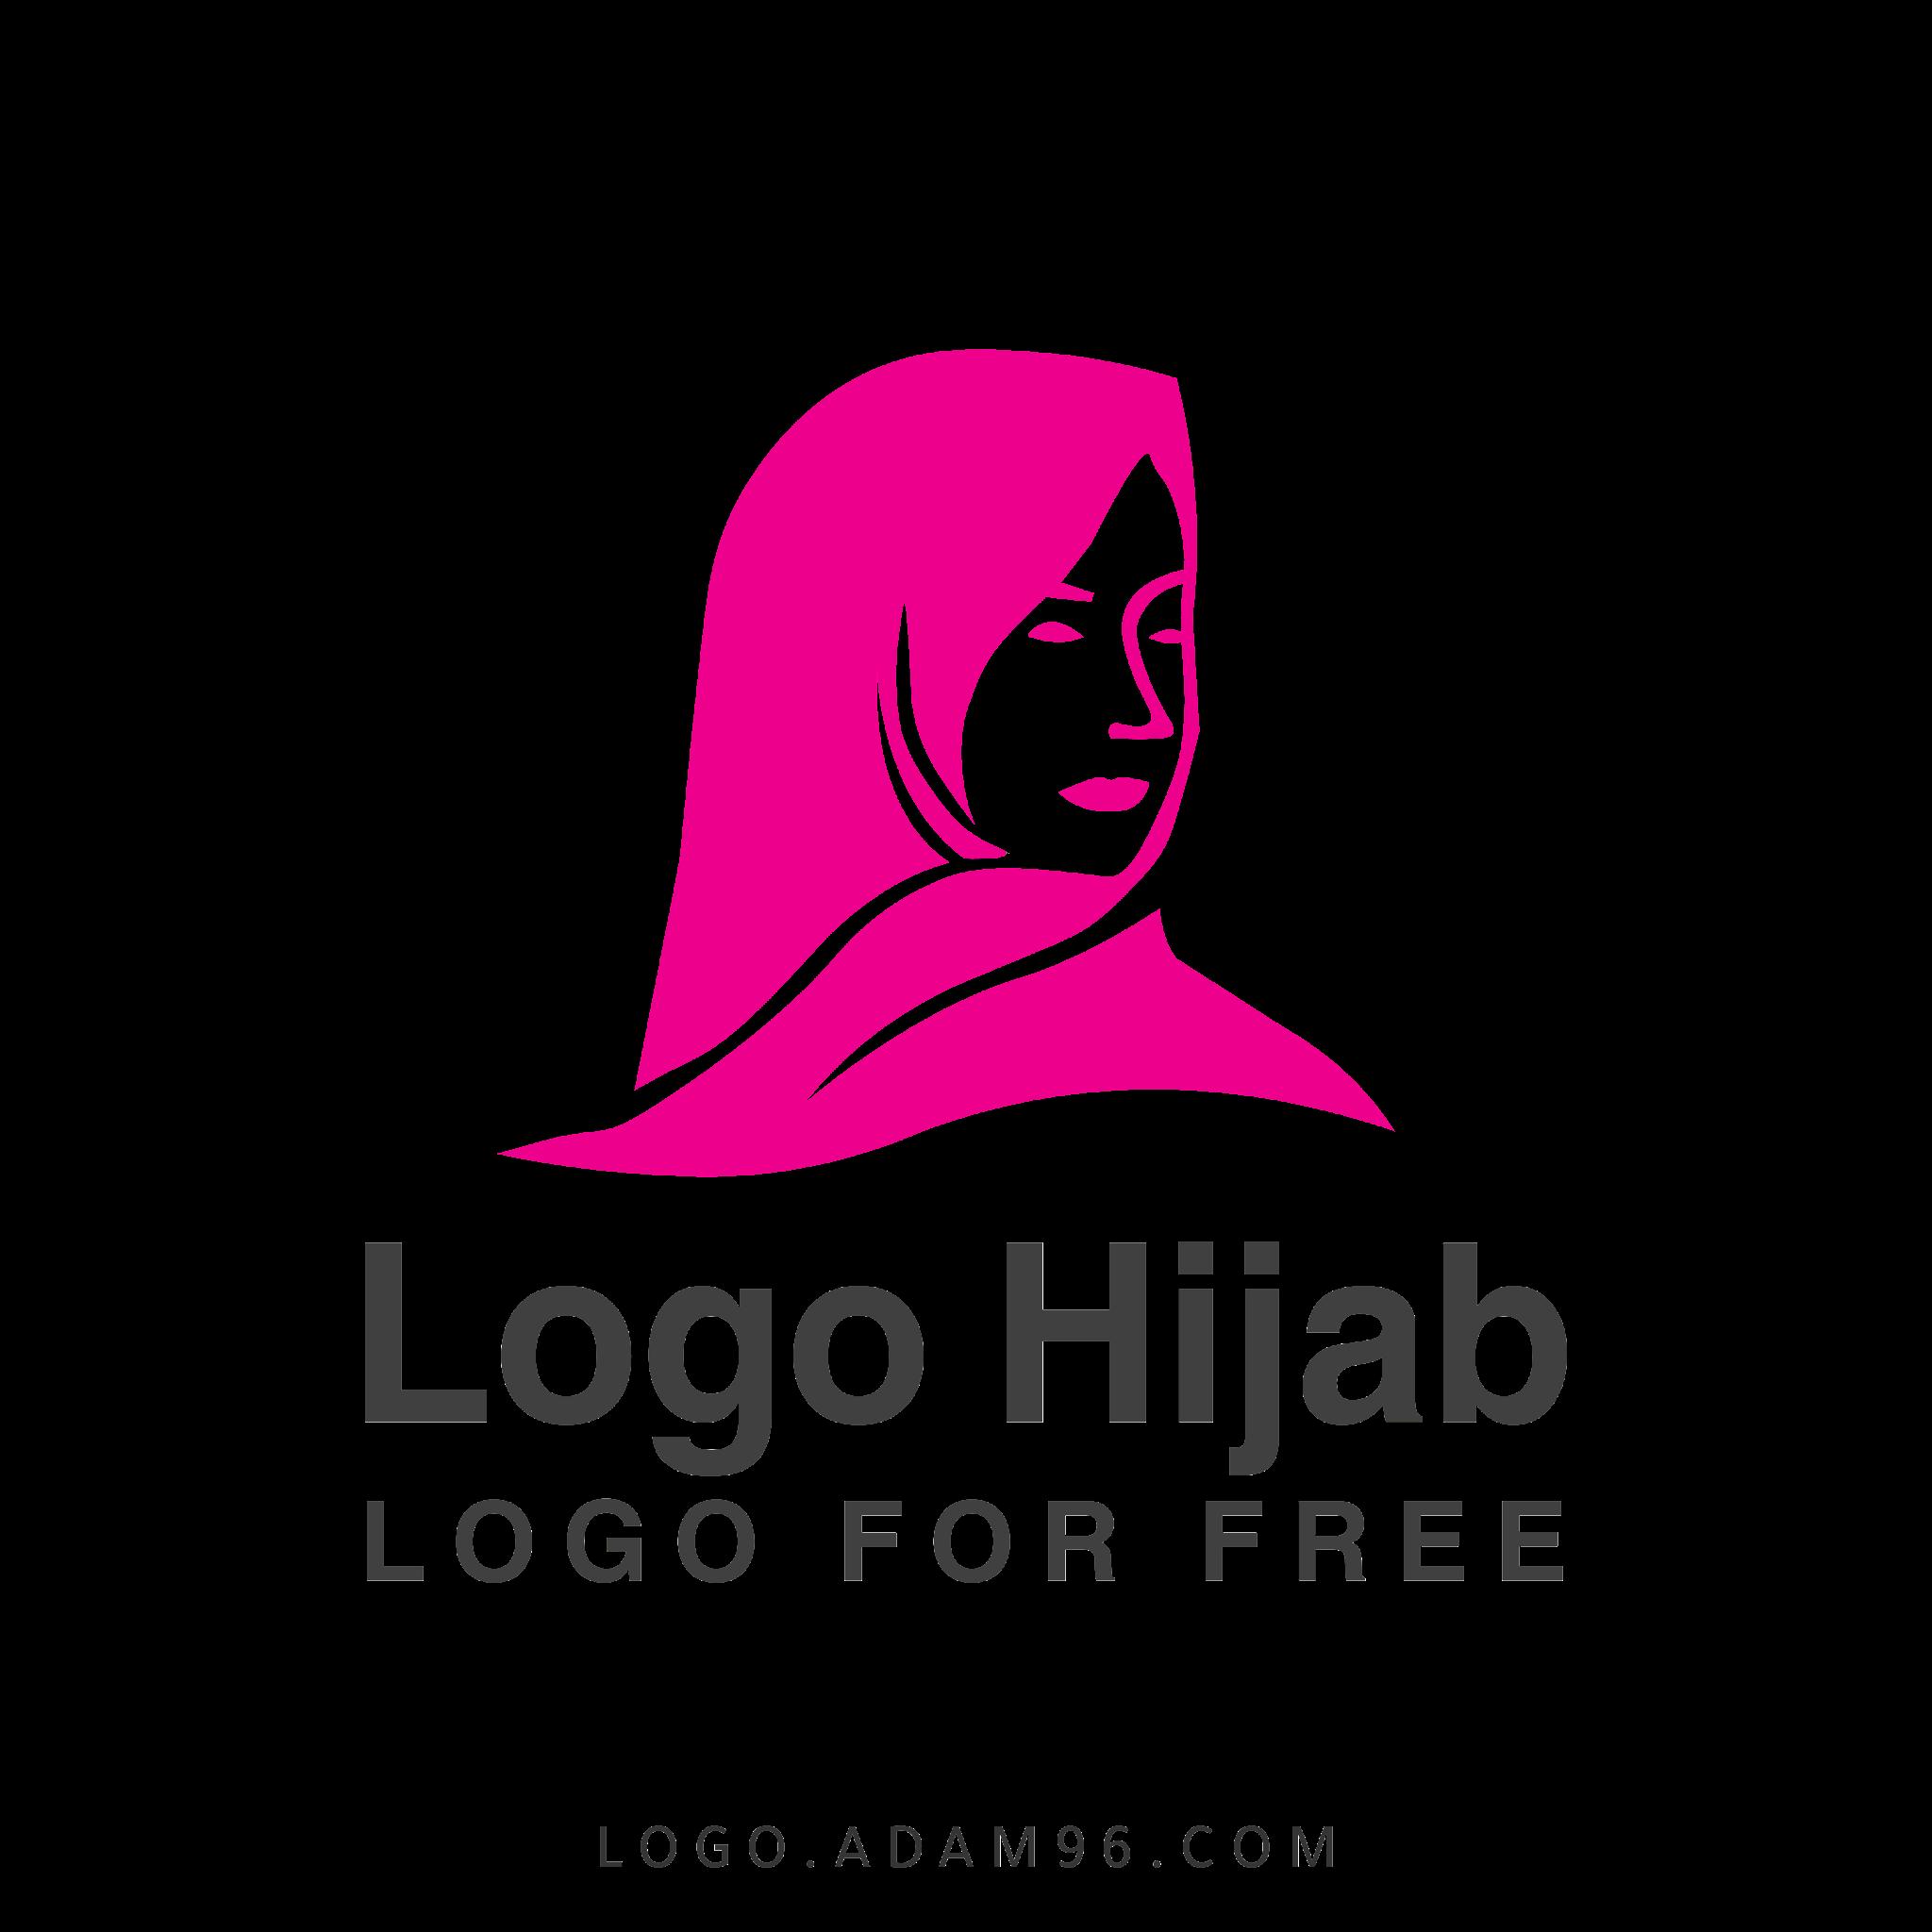 تحميل شعار حجاب مجاناً جاهز للتعديل بصيغة SVG PDF AI